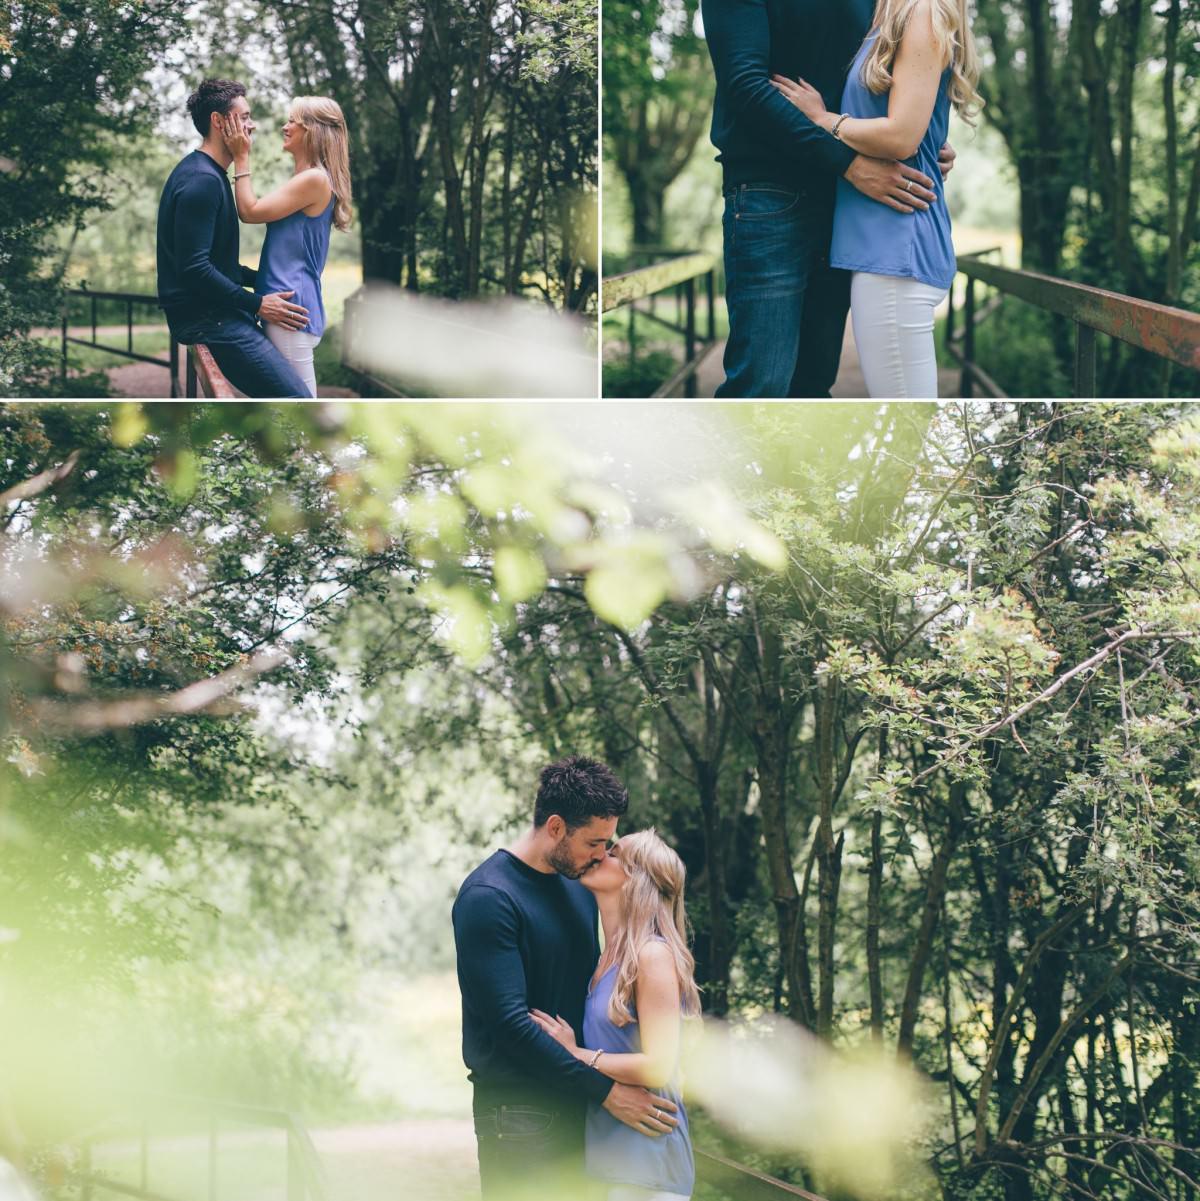 rachel_lambert_photography_welsh_wedding_photographer_harriet_dean_engagement_shoot_caldicot_castle_lower_slaughter_manor_house_ 13